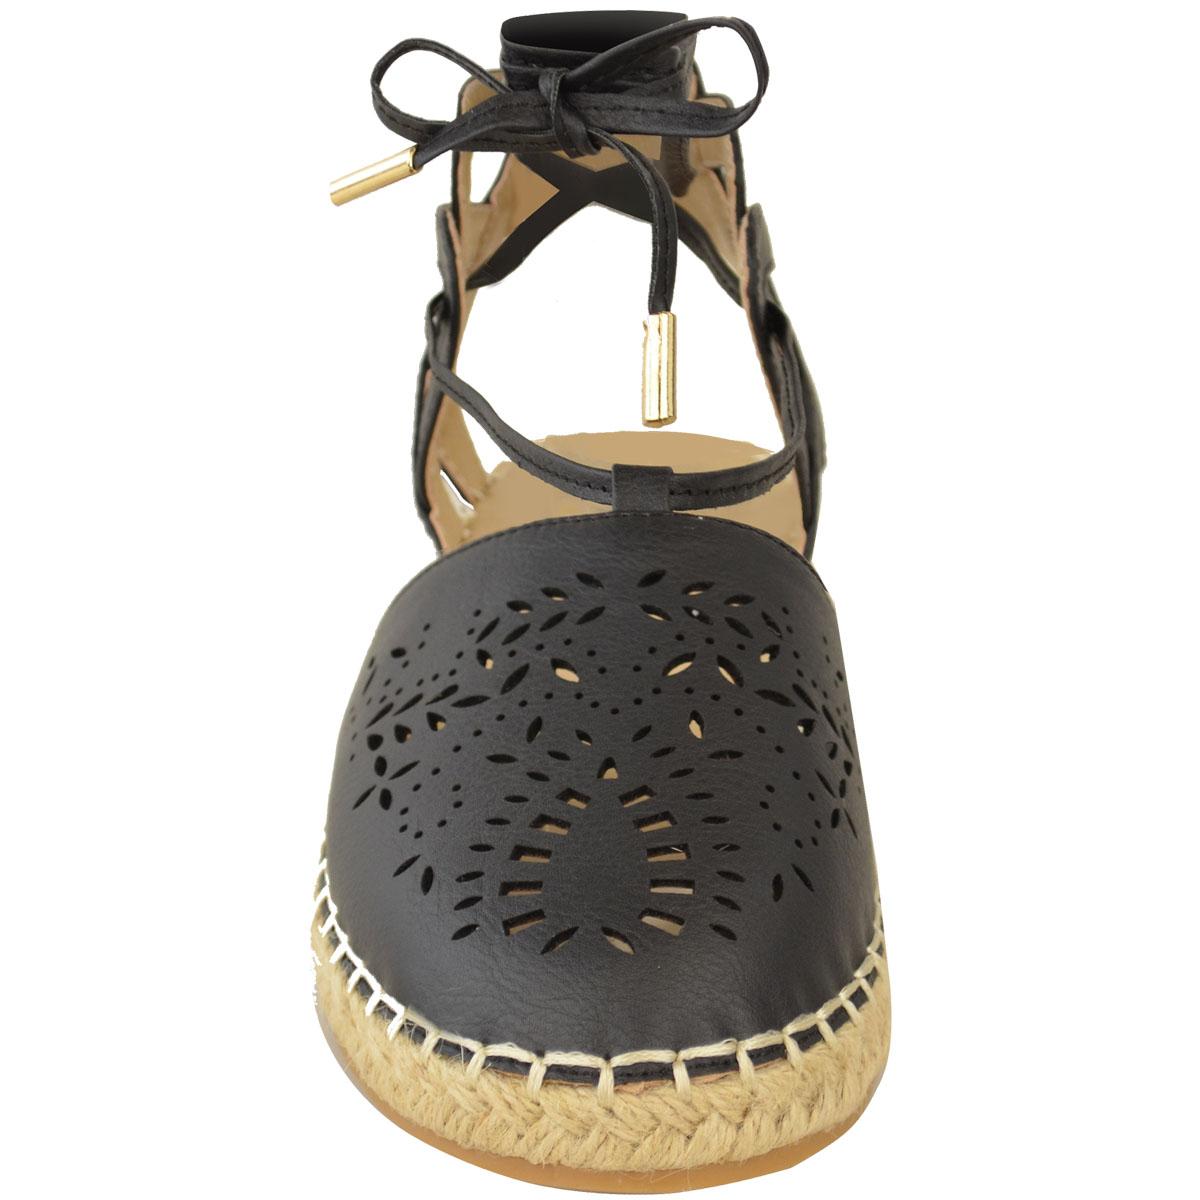 Sandalias Planas Con Cordones Alpargata señoras para mujer Tobillo con Tiras Verano Zapatos Talla